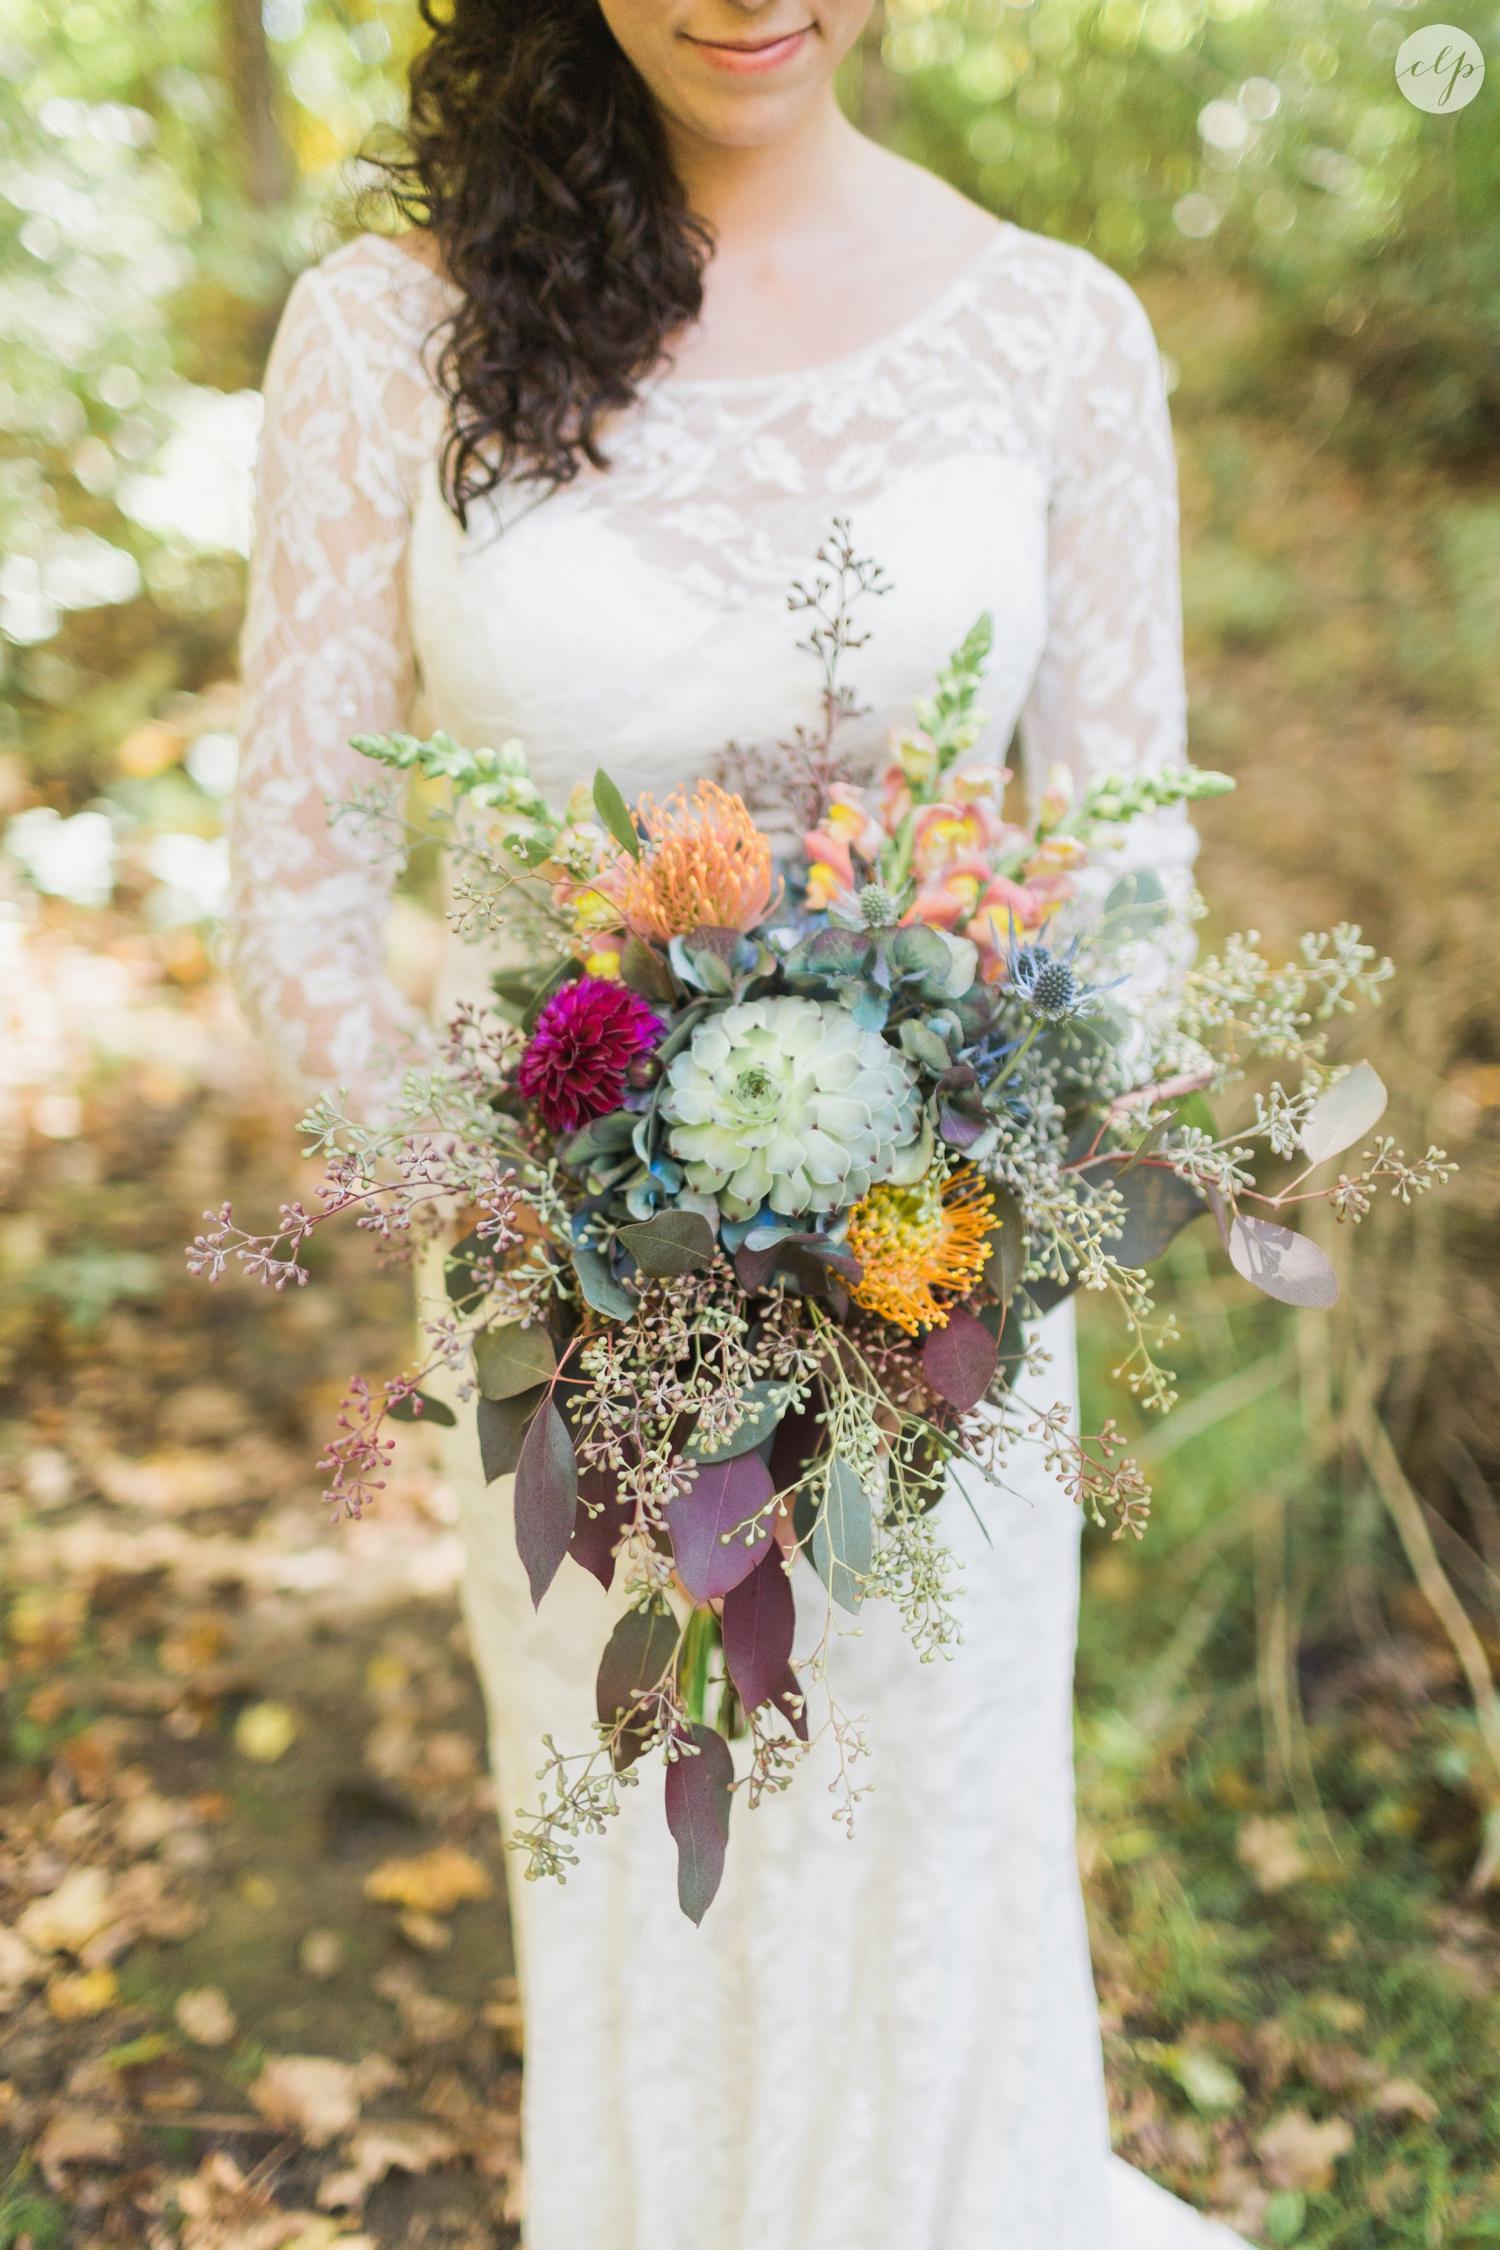 Outdoor-Wedding-in-the-Woods-Photography_4190.jpg